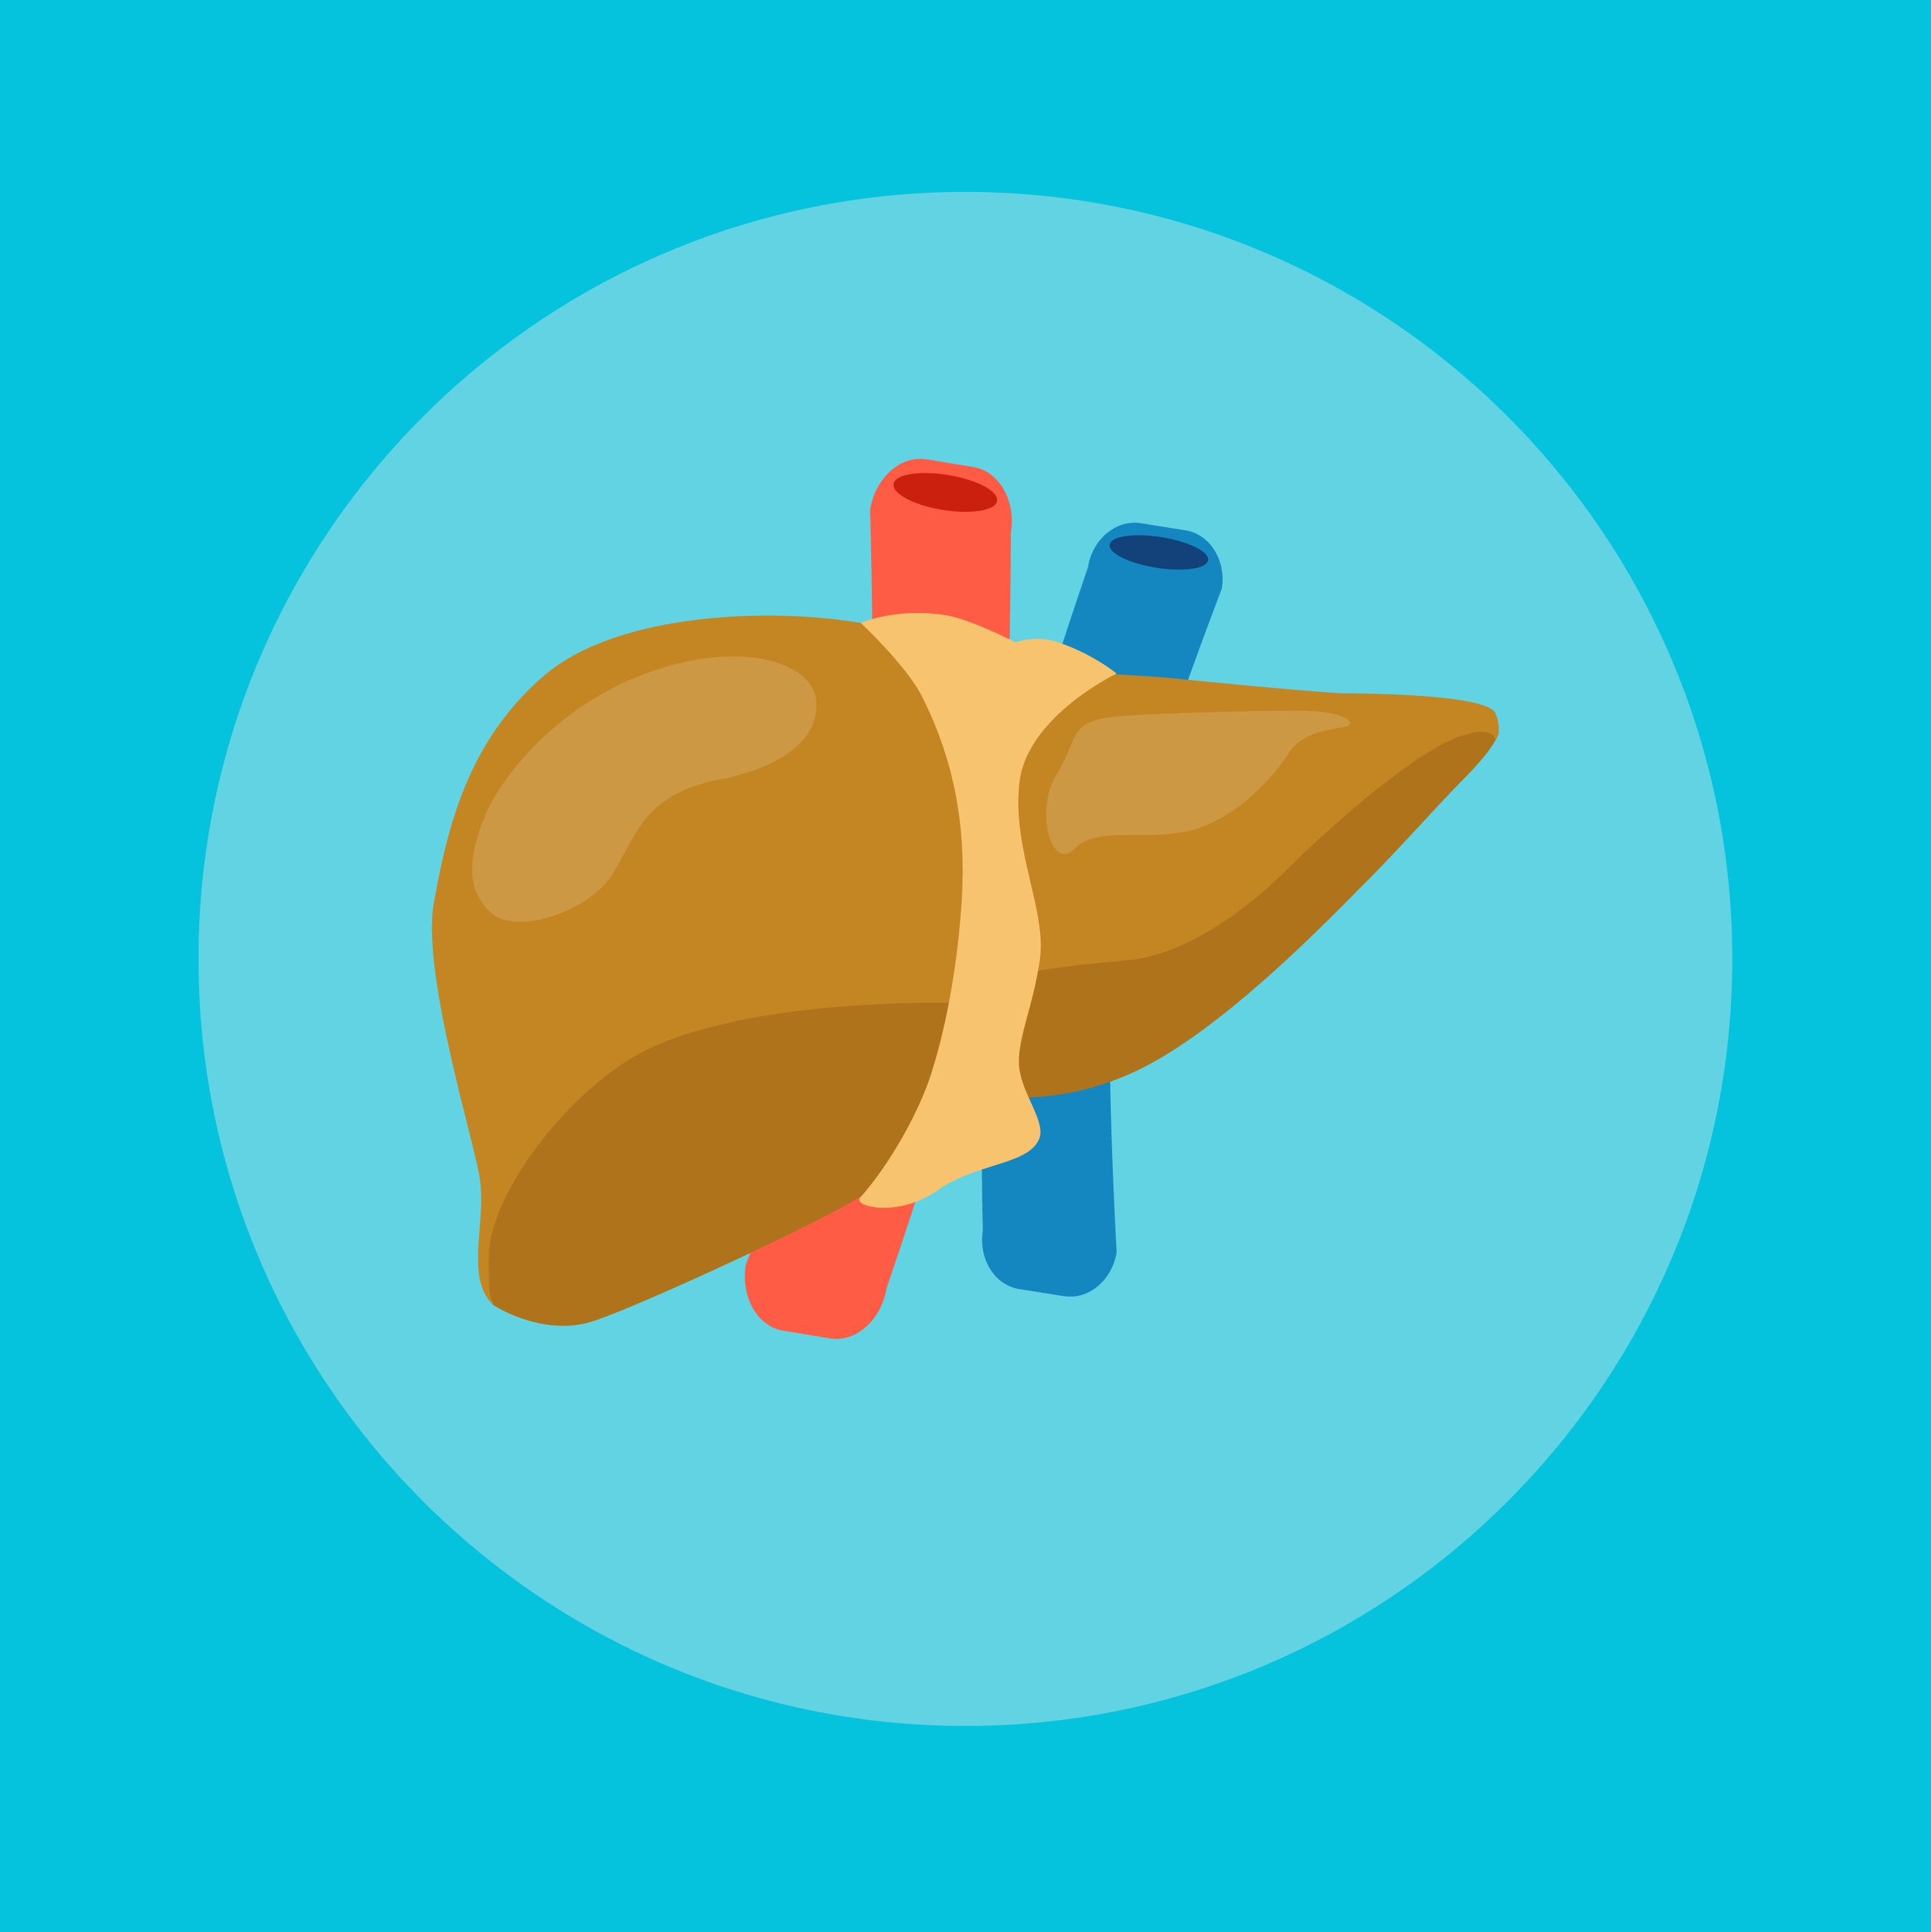 liver,fatty liver,penyakit liver,bahaya hati berlemak,bahaya fatty liver